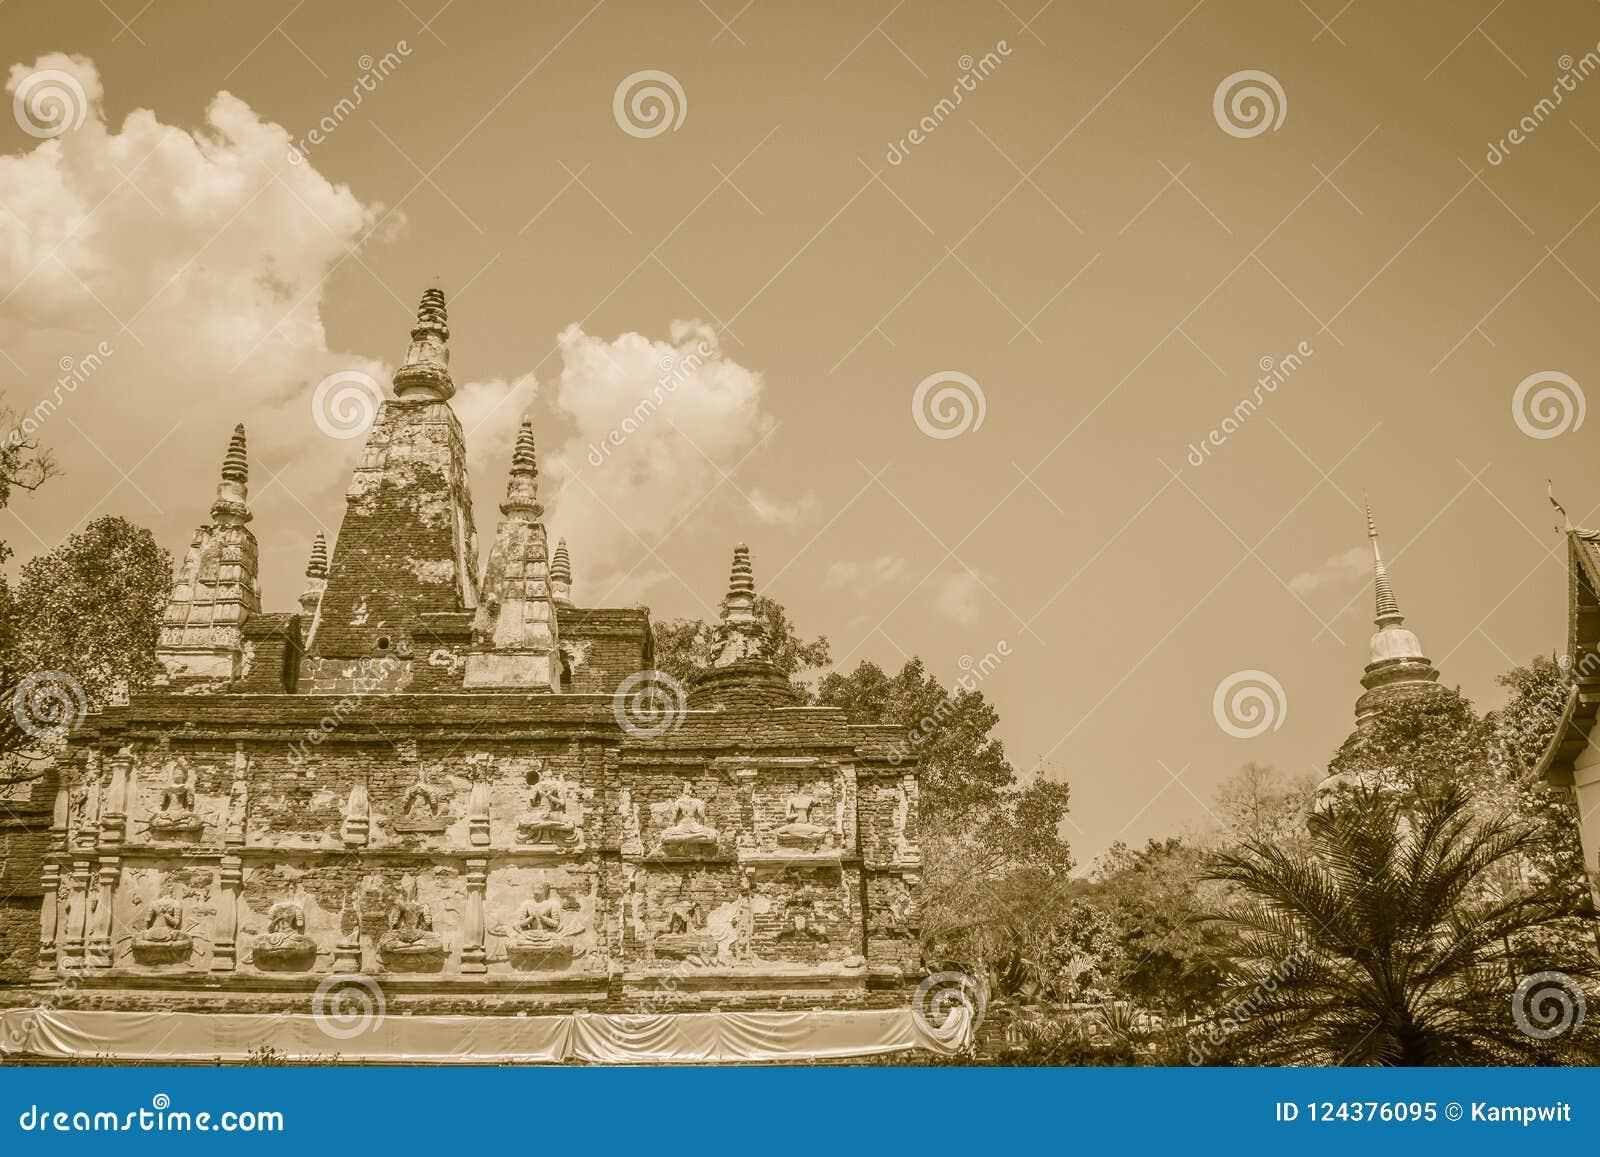 Wat Chet Yot (Wat Jed Yod) ή Wat Photharam Maha Vihara, ο δημόσιος βουδιστικός ναός με τη στέψη της επίπεδης στέγης του ορθογώνιο